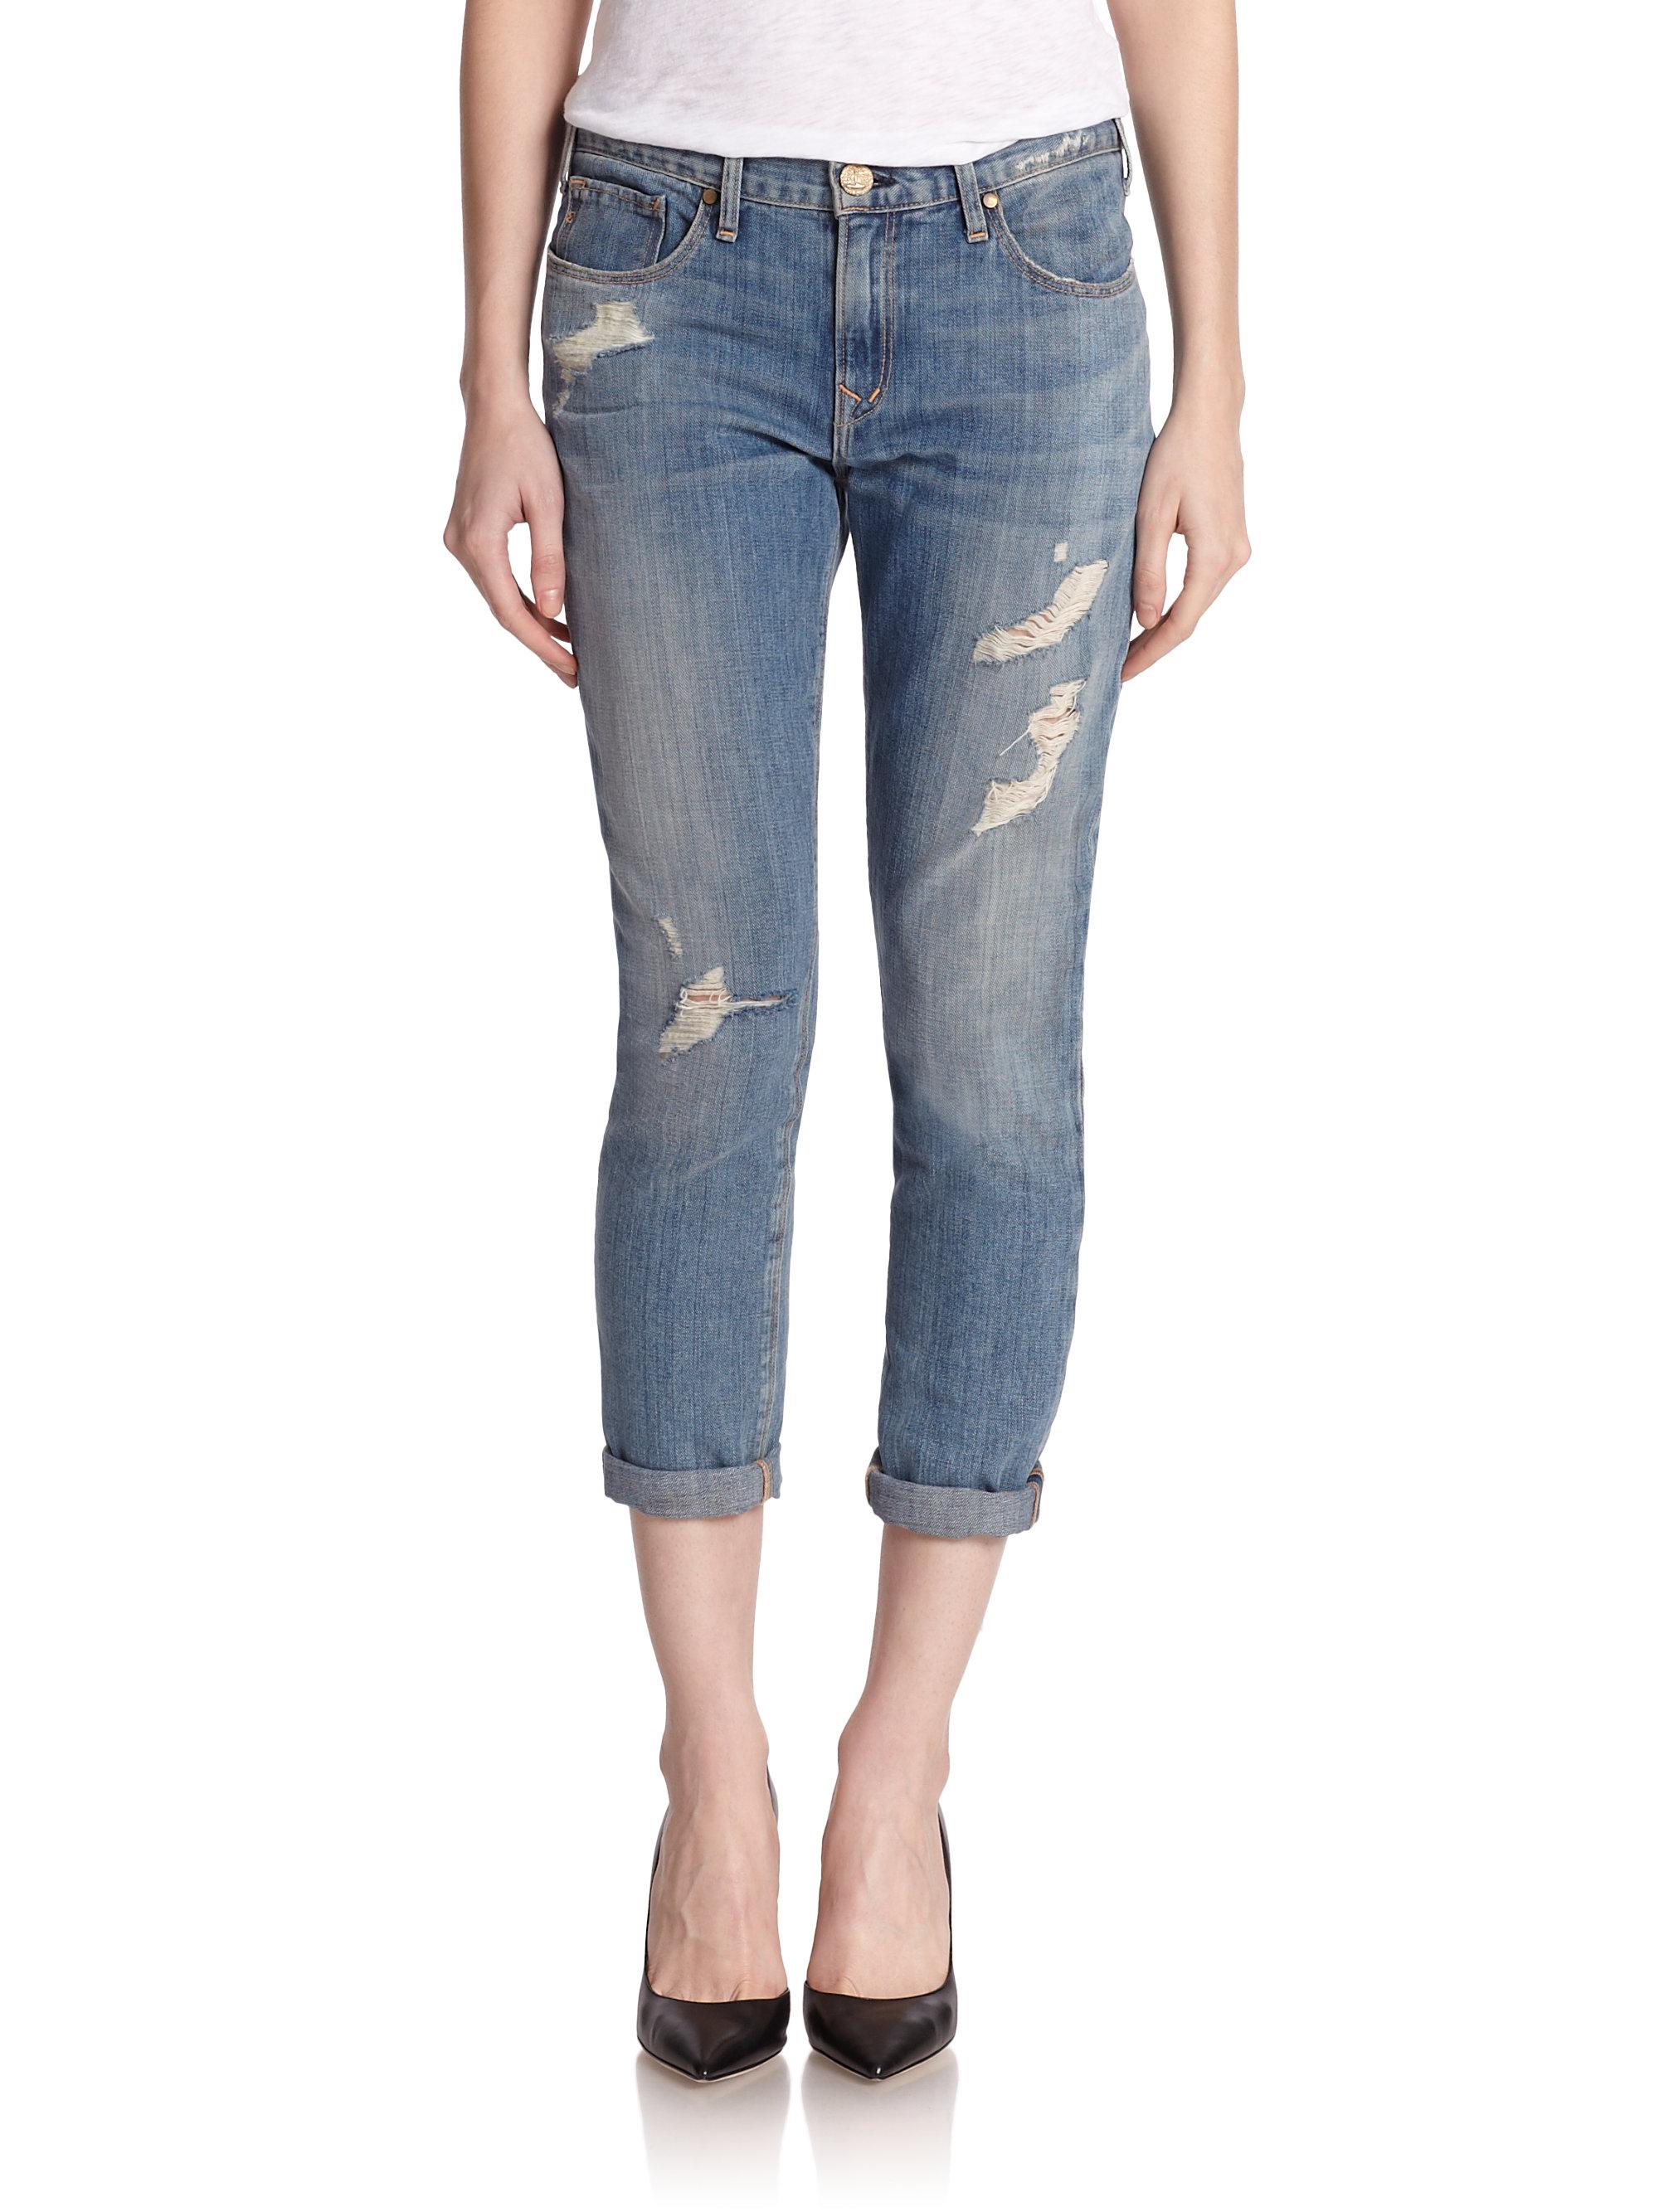 jeans mrs robinson escort